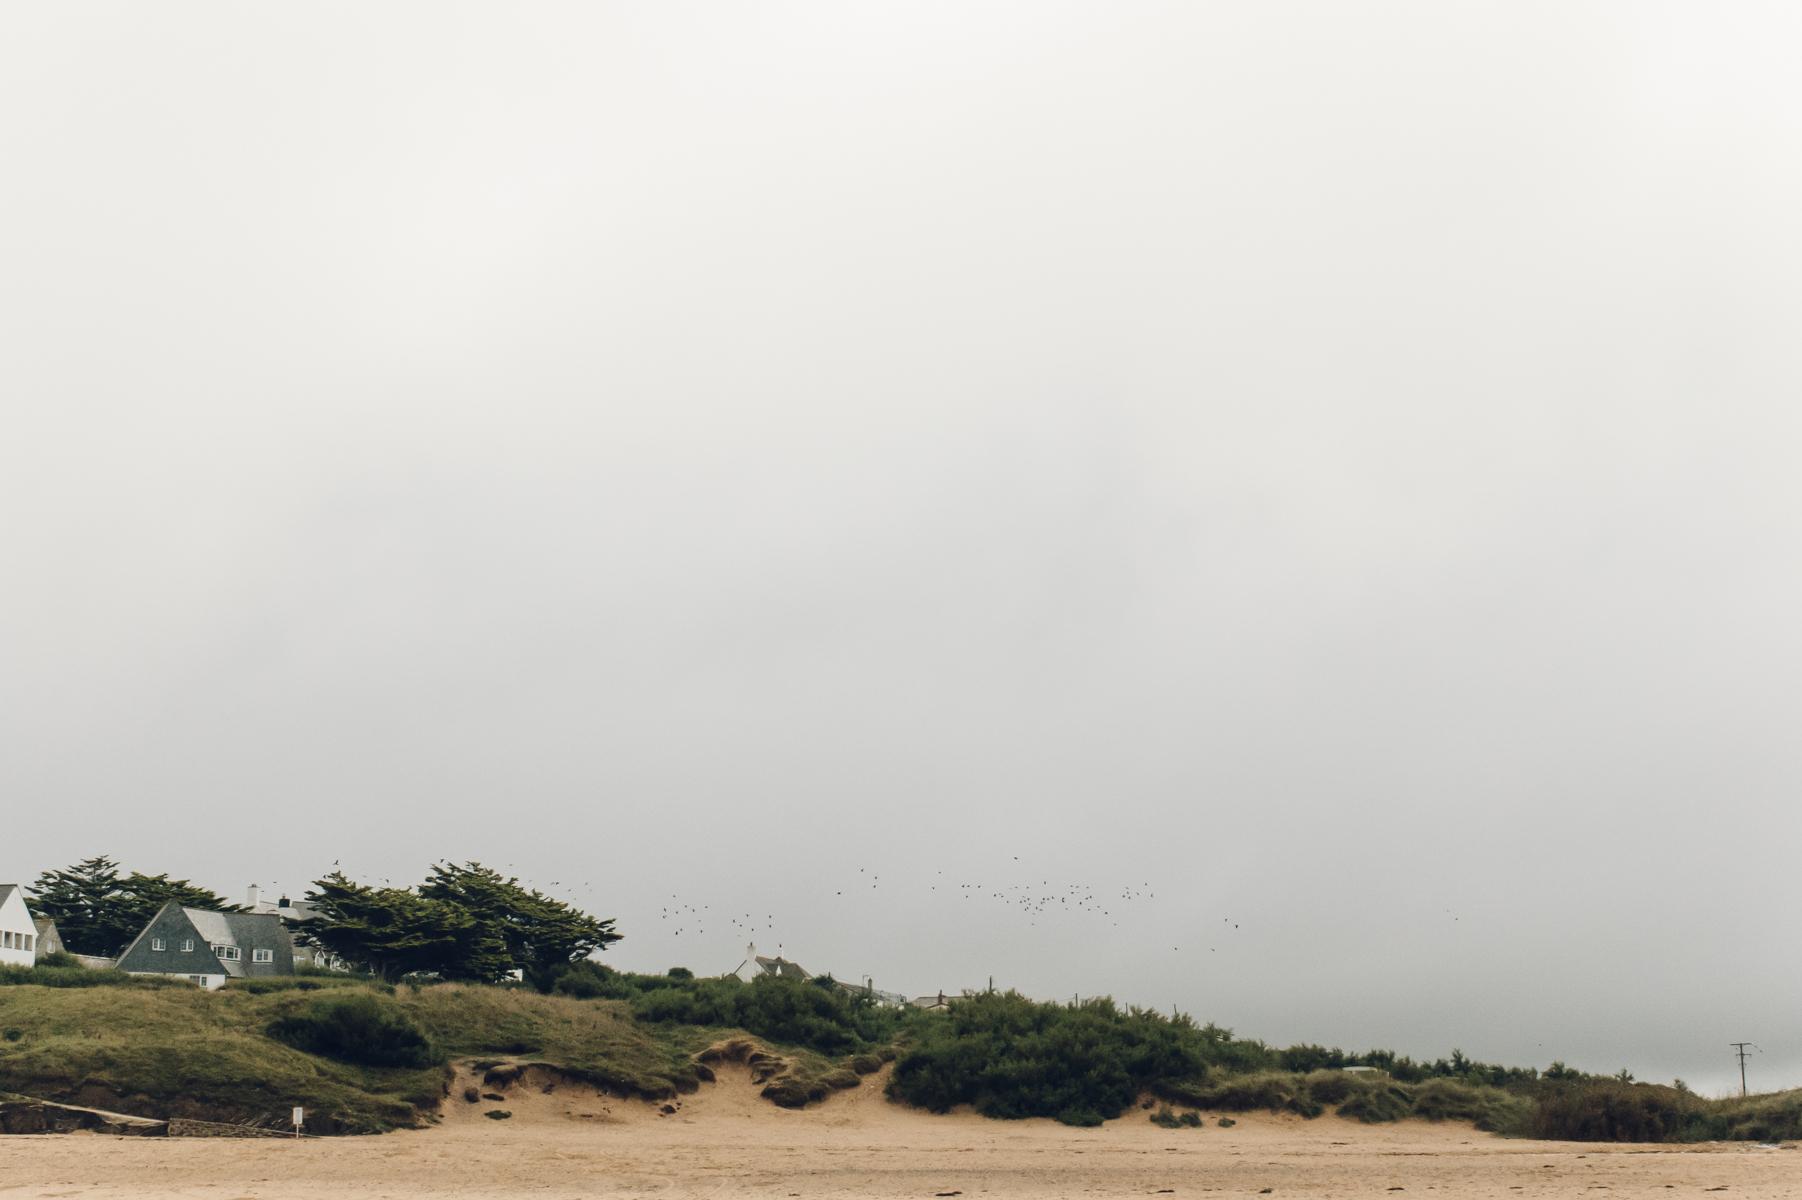 Moody beach and sand dunes.